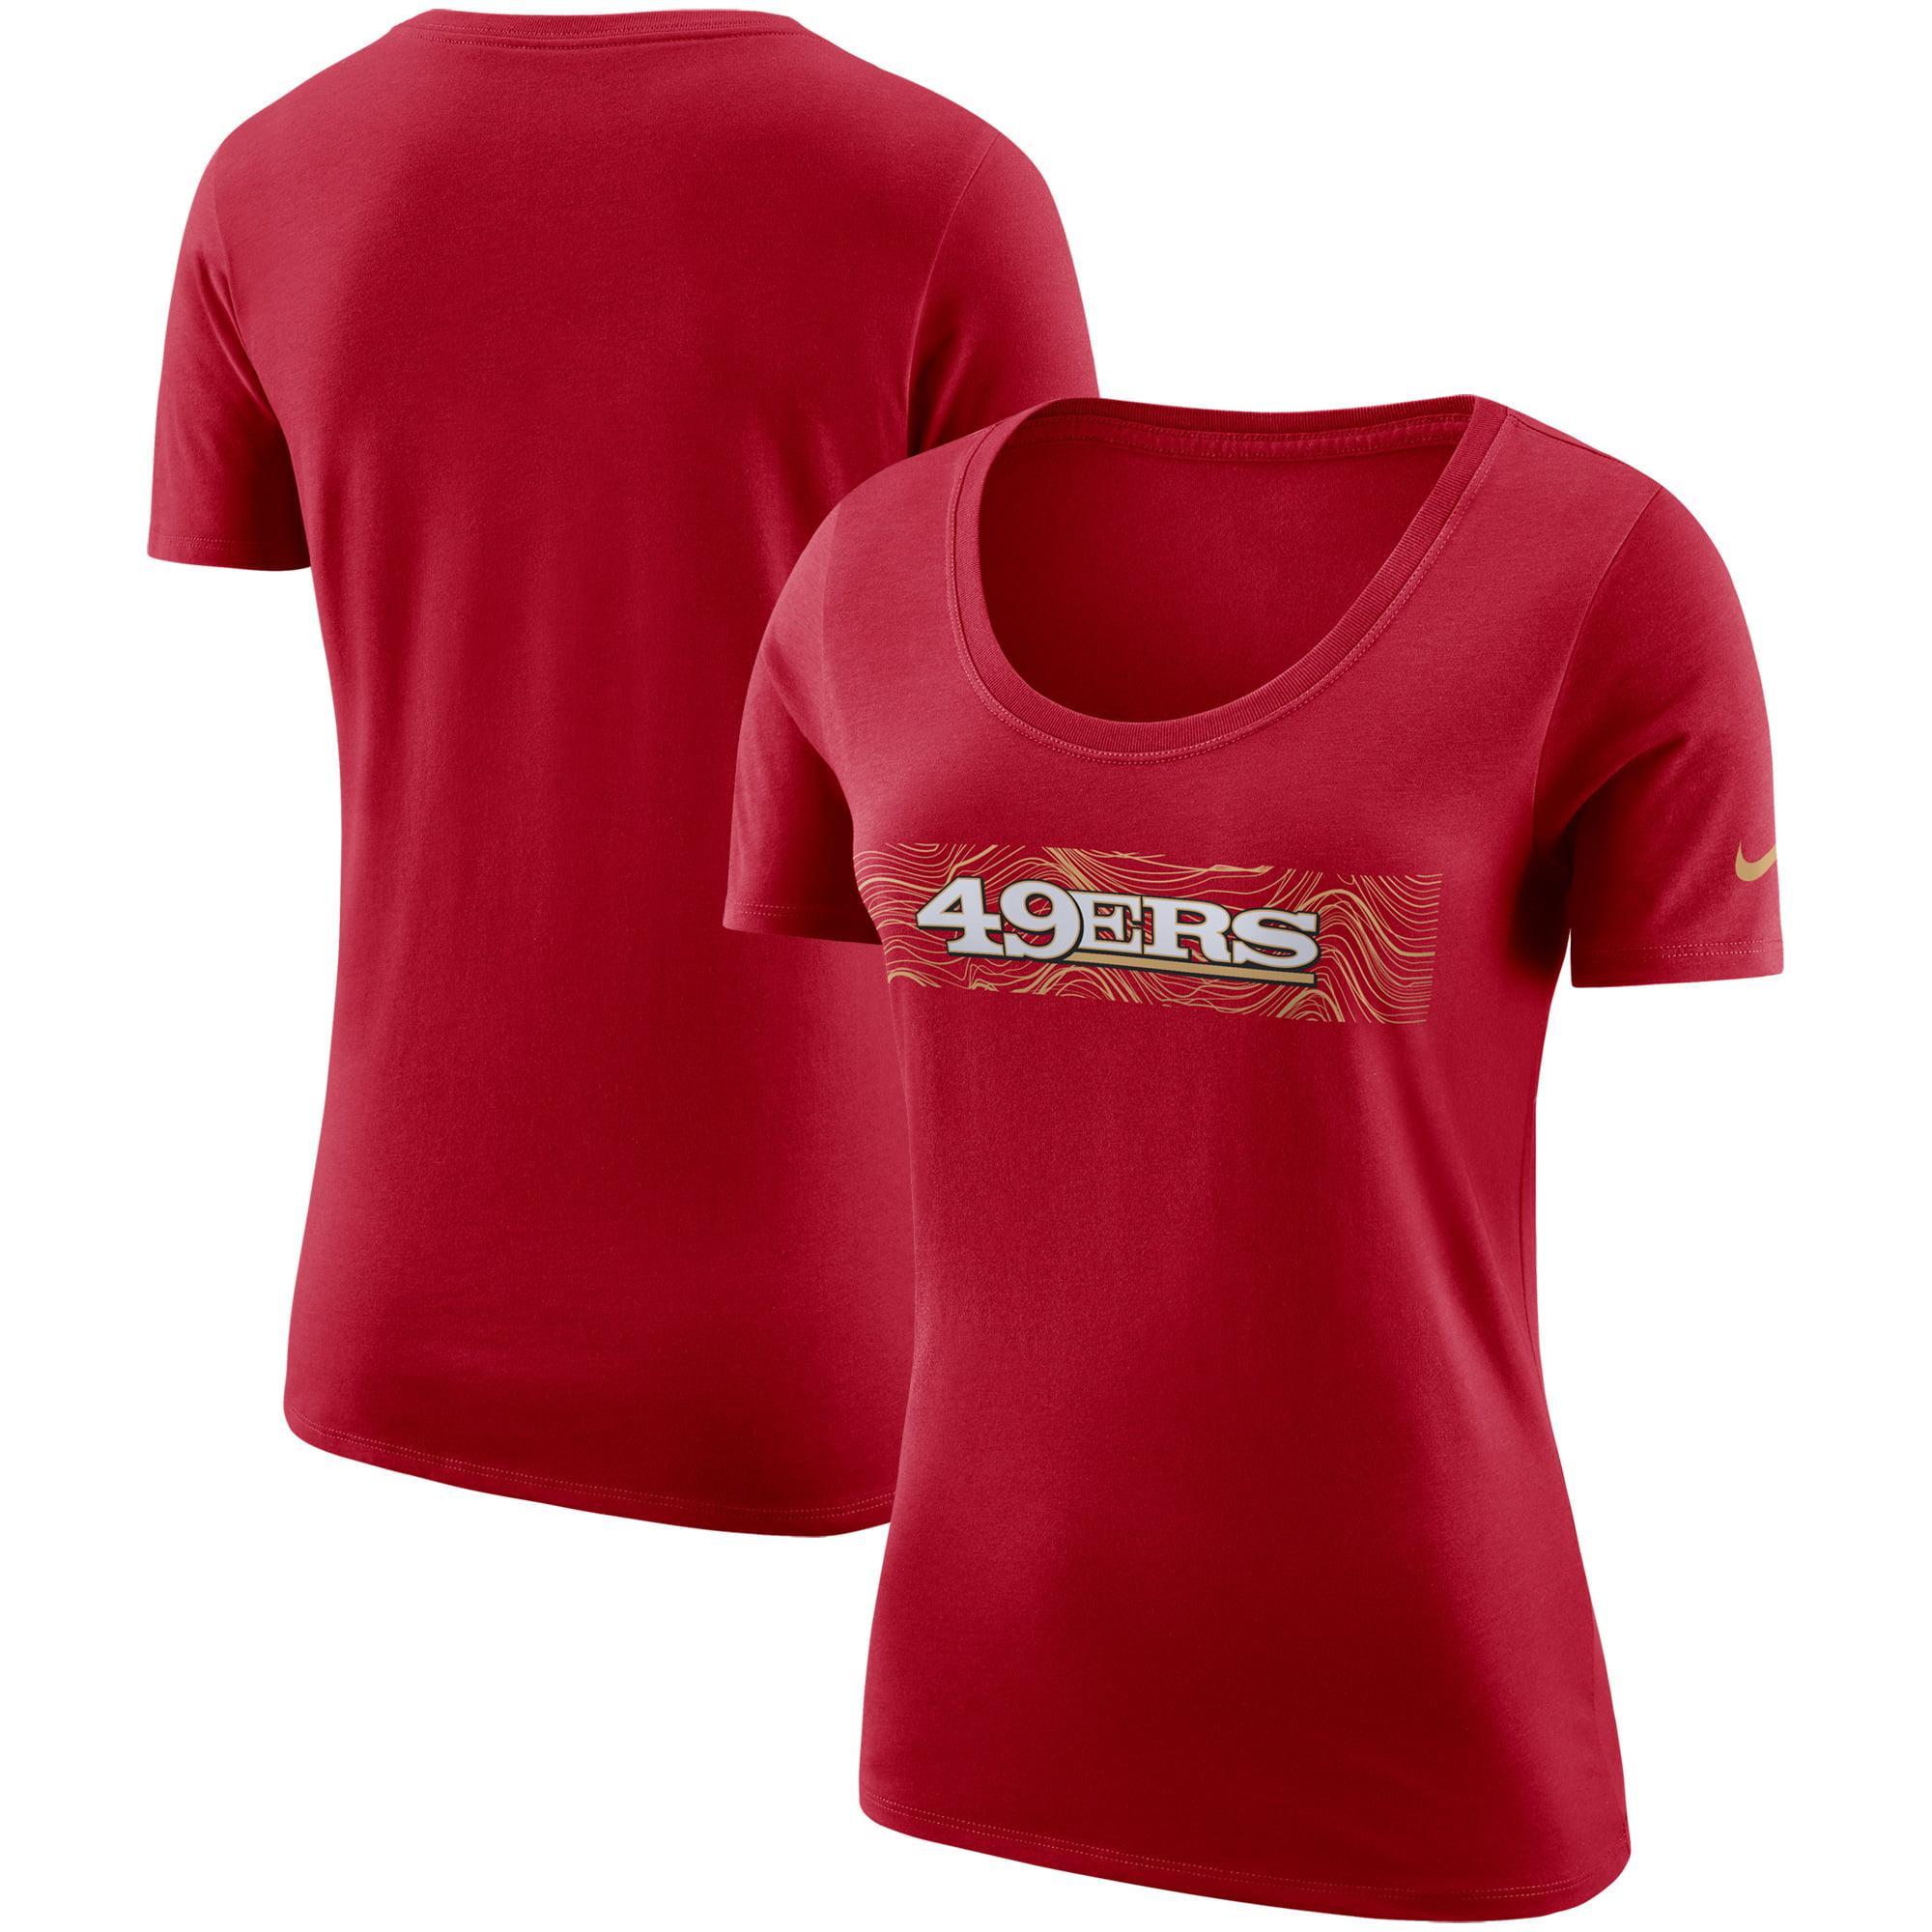 San Francisco 49ers Nike Women's Sideline Team T-Shirt - Scarlet